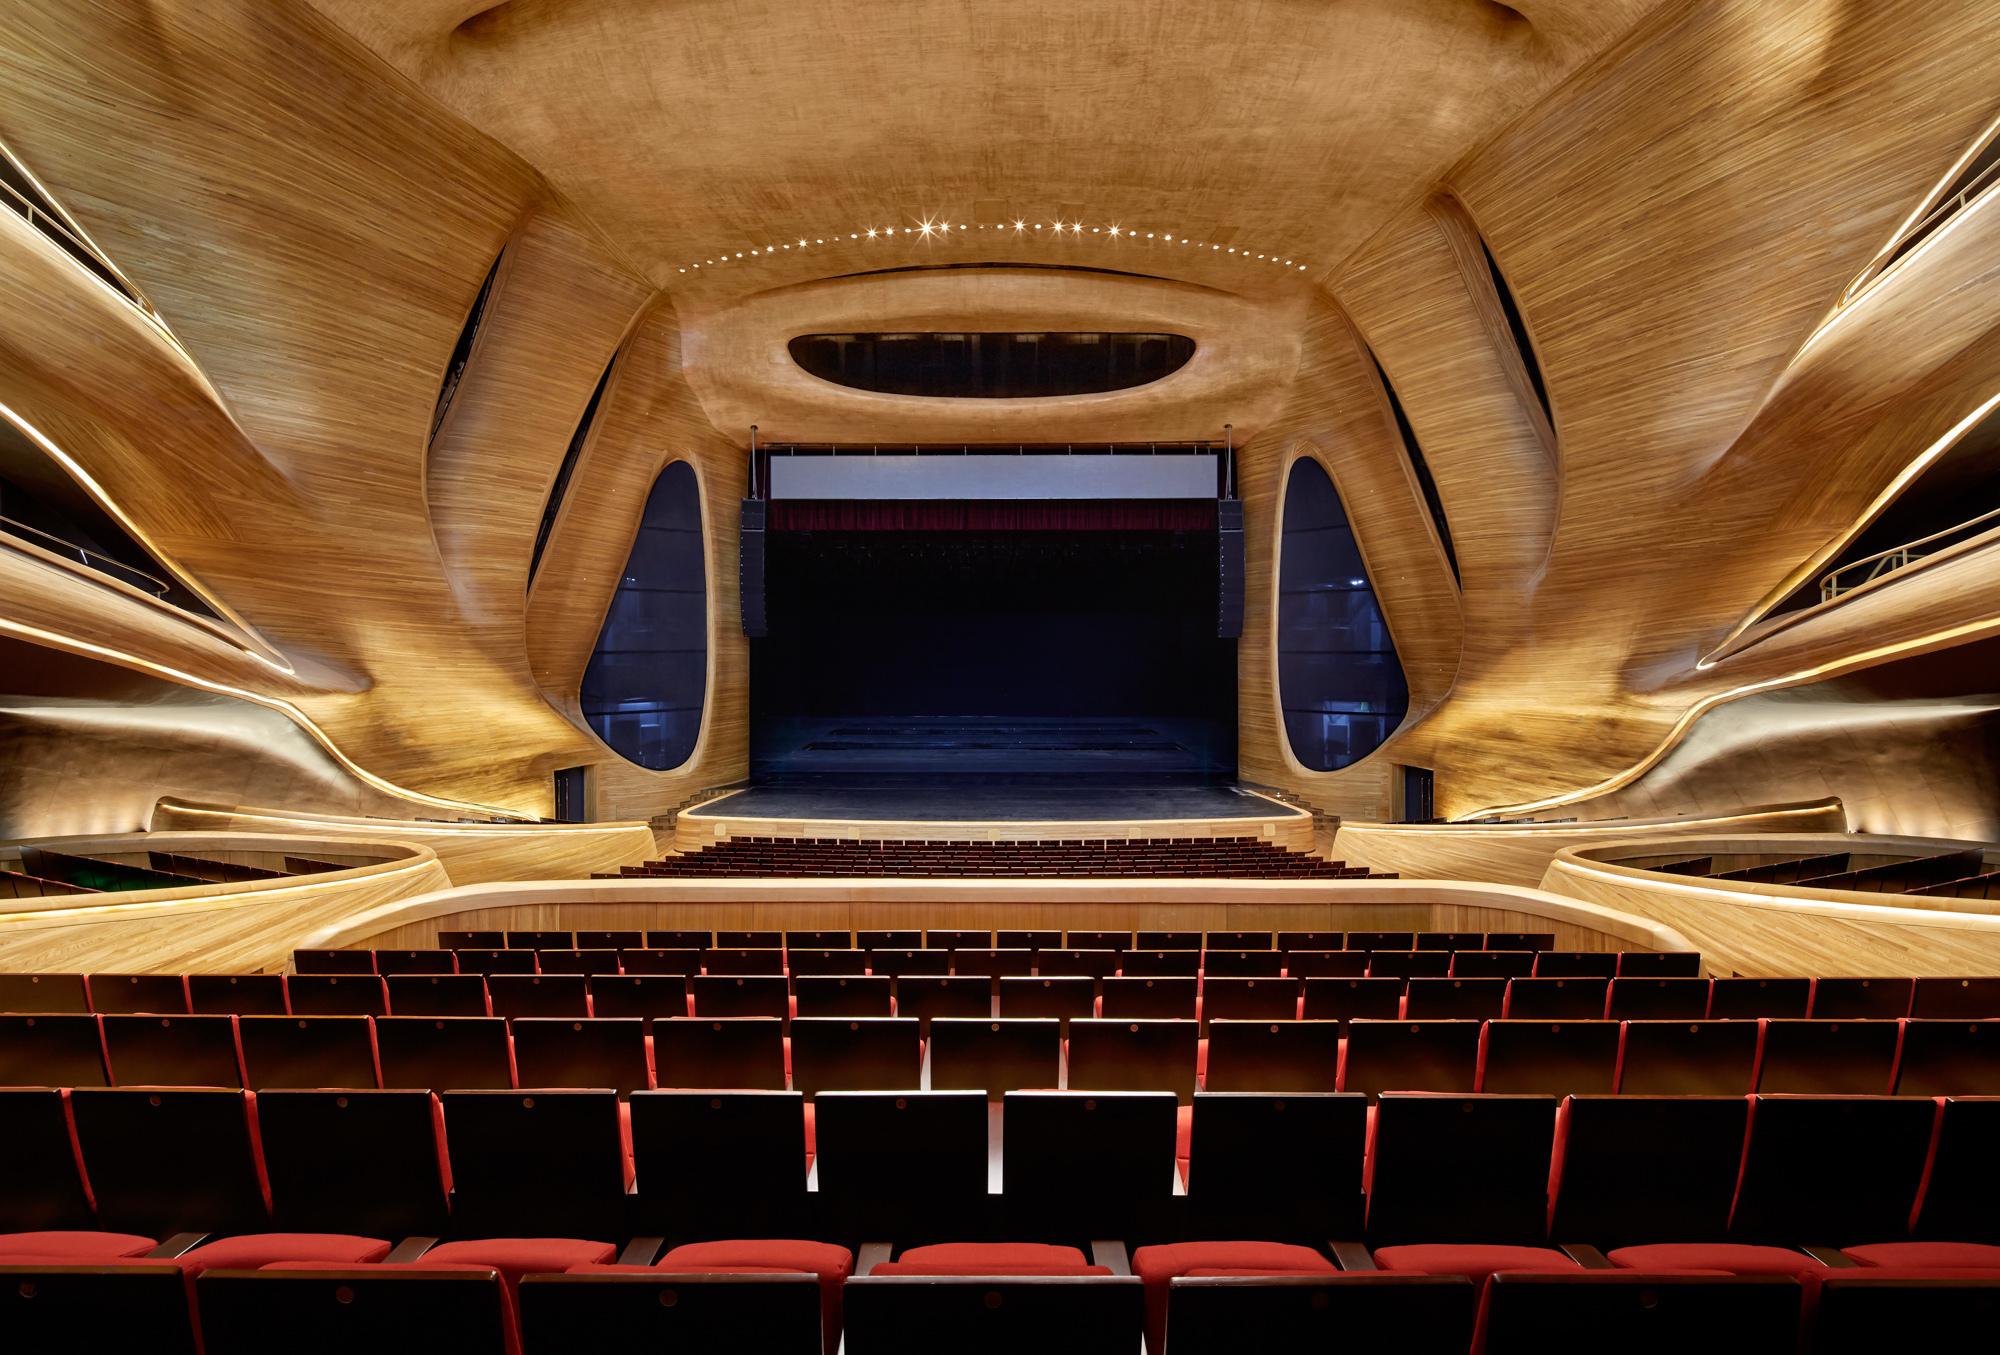 MAD_Harbin_Opera_House_020_©Hufton_Crow.jpg